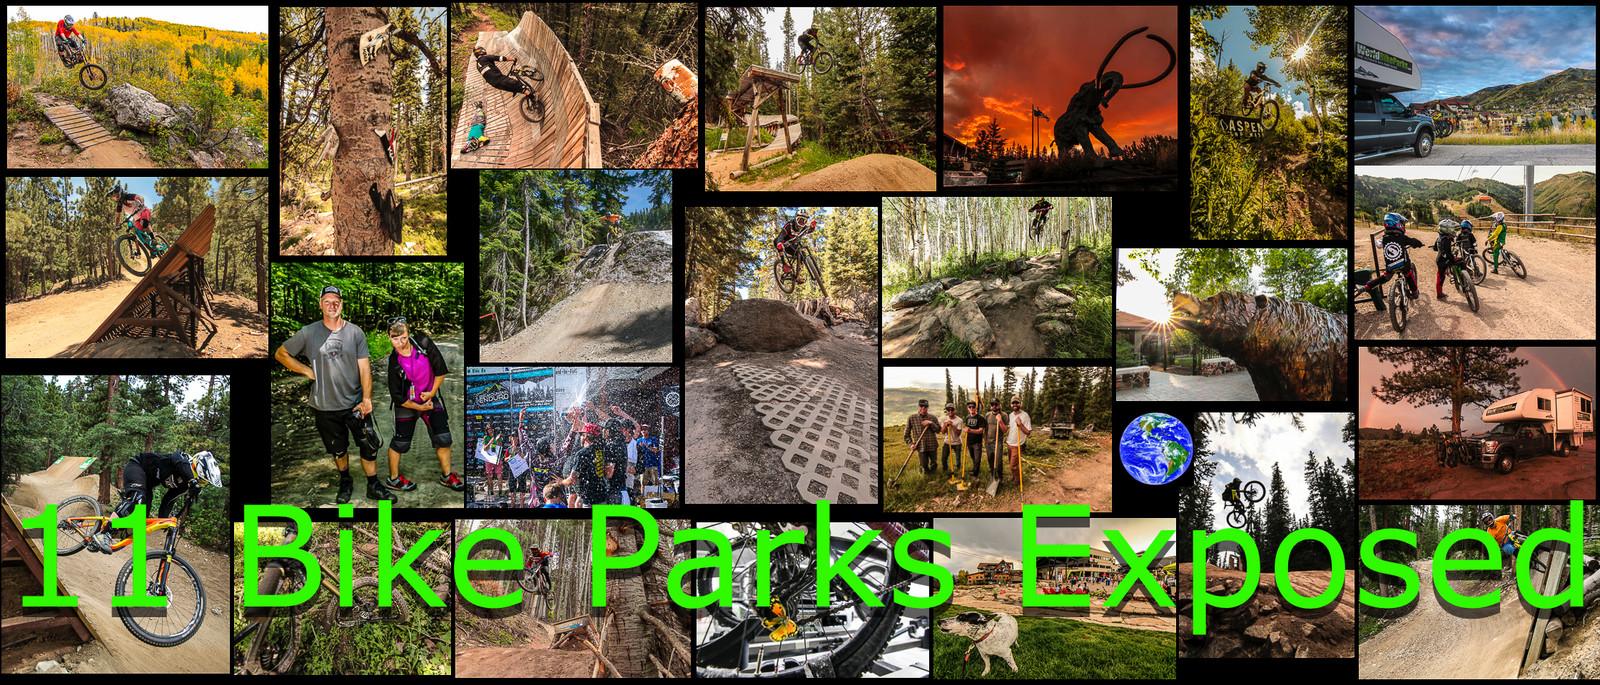 2015 Summer Bike Park Tour Photo Collage